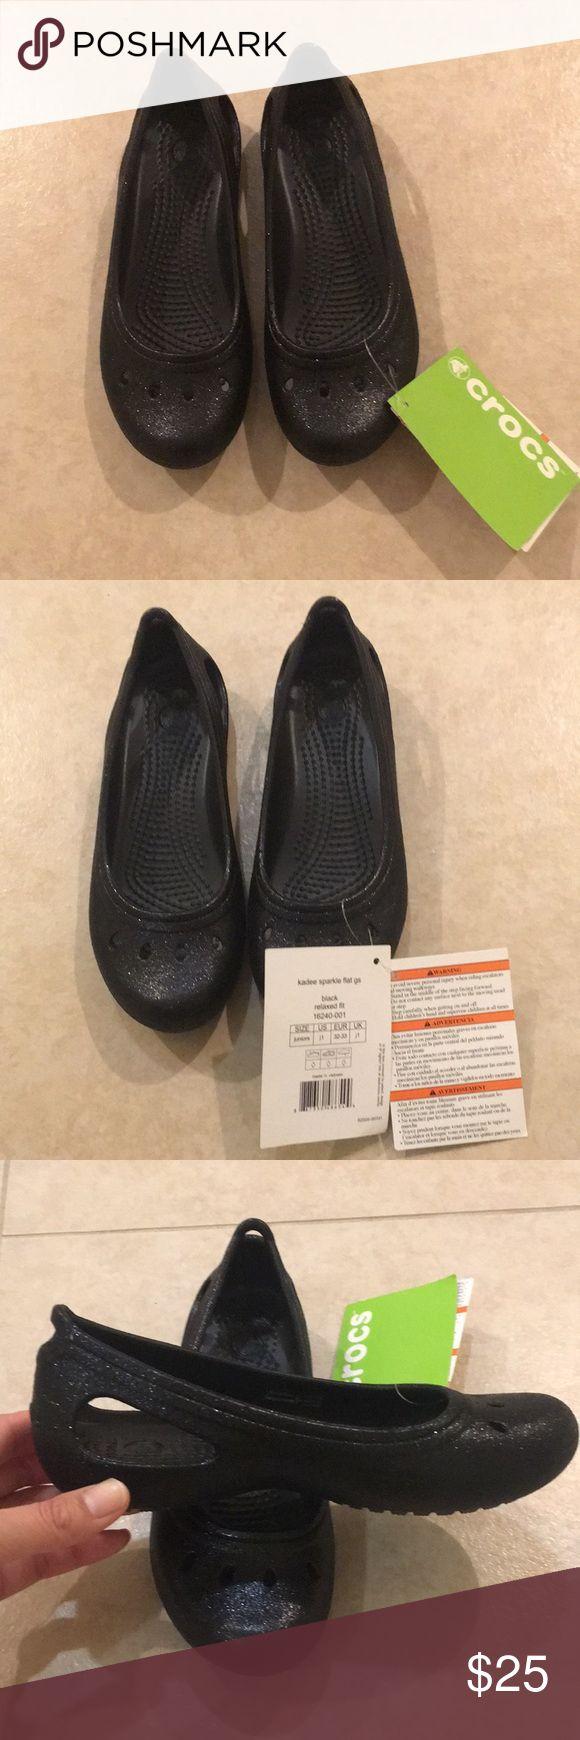 NWT crocs girls Kadee sparkle flats black NWT crocs girls Kadee sparkle flats in black size 1 CROCS Shoes Sandals & Flip Flops